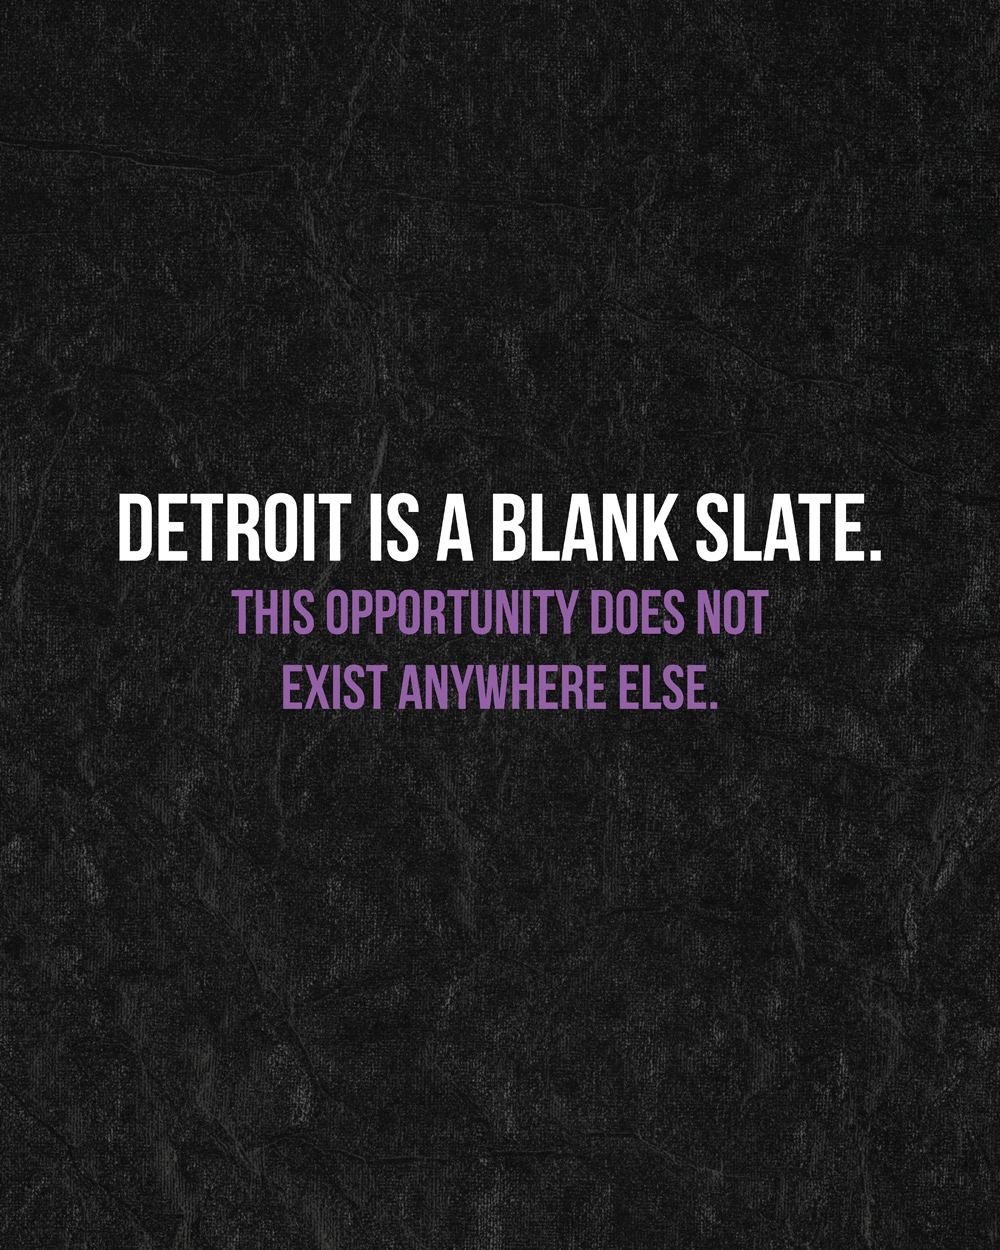 michael-hnatiuk-detroit-stories-2g